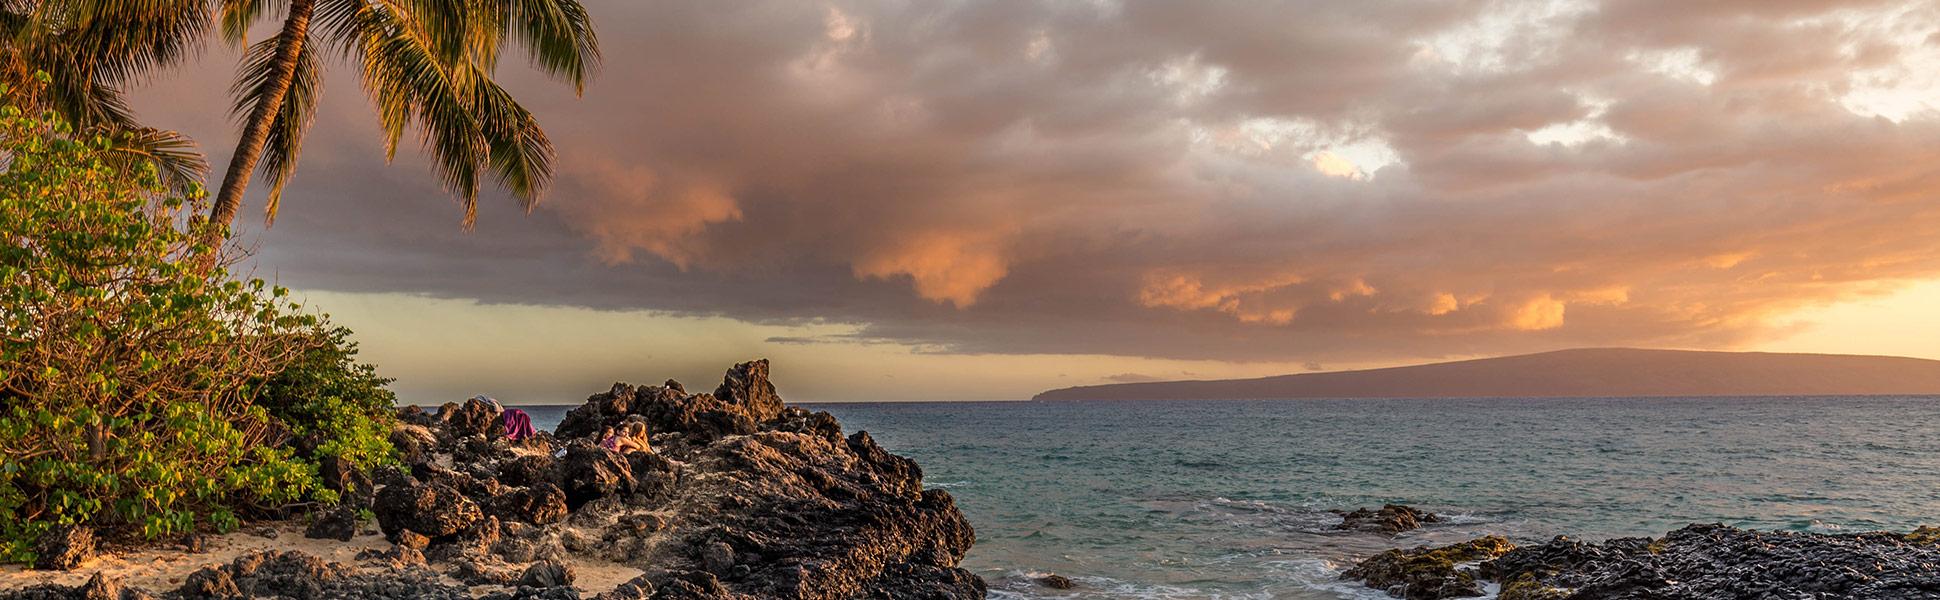 hawaii beach ocean